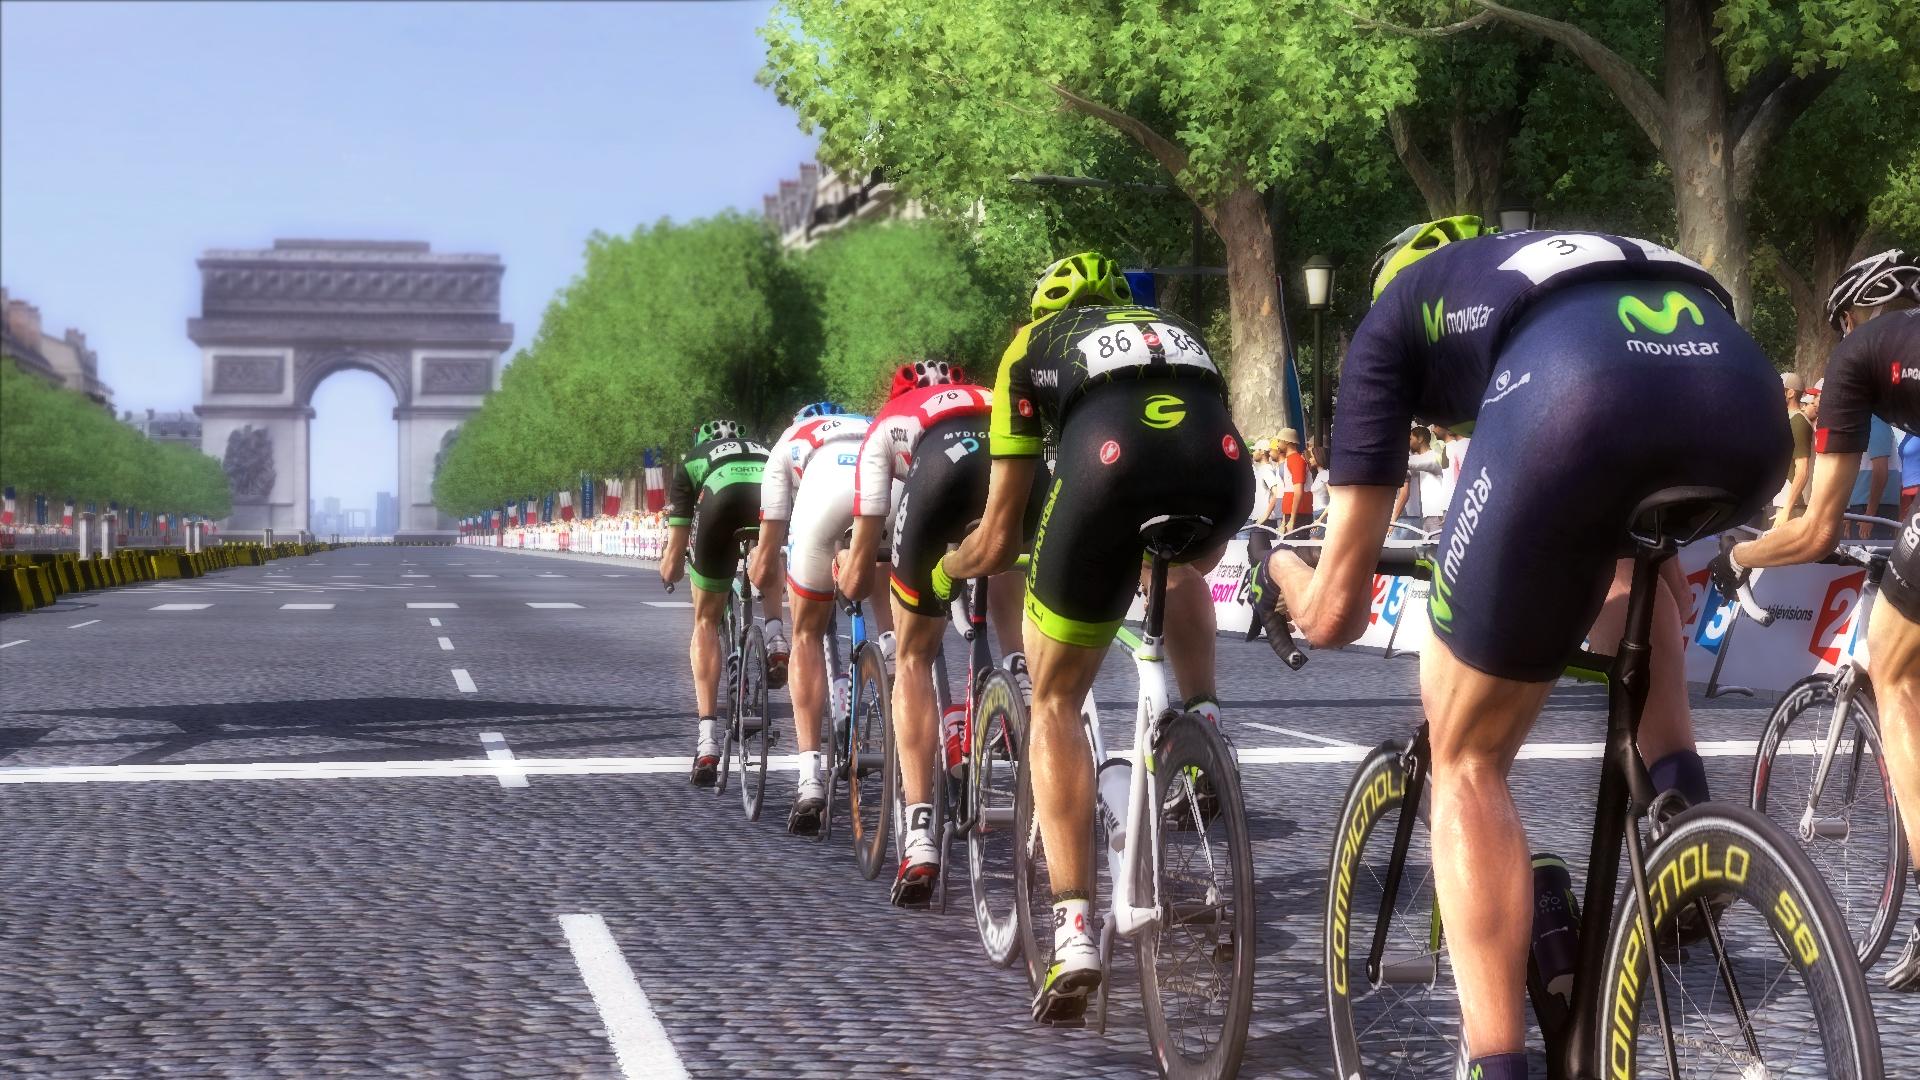 Pro Cycling Manager 2015 ESPAÑOL PC Full (CODEX) + REPACK PROPER 1 DVD5 (JPW) 3